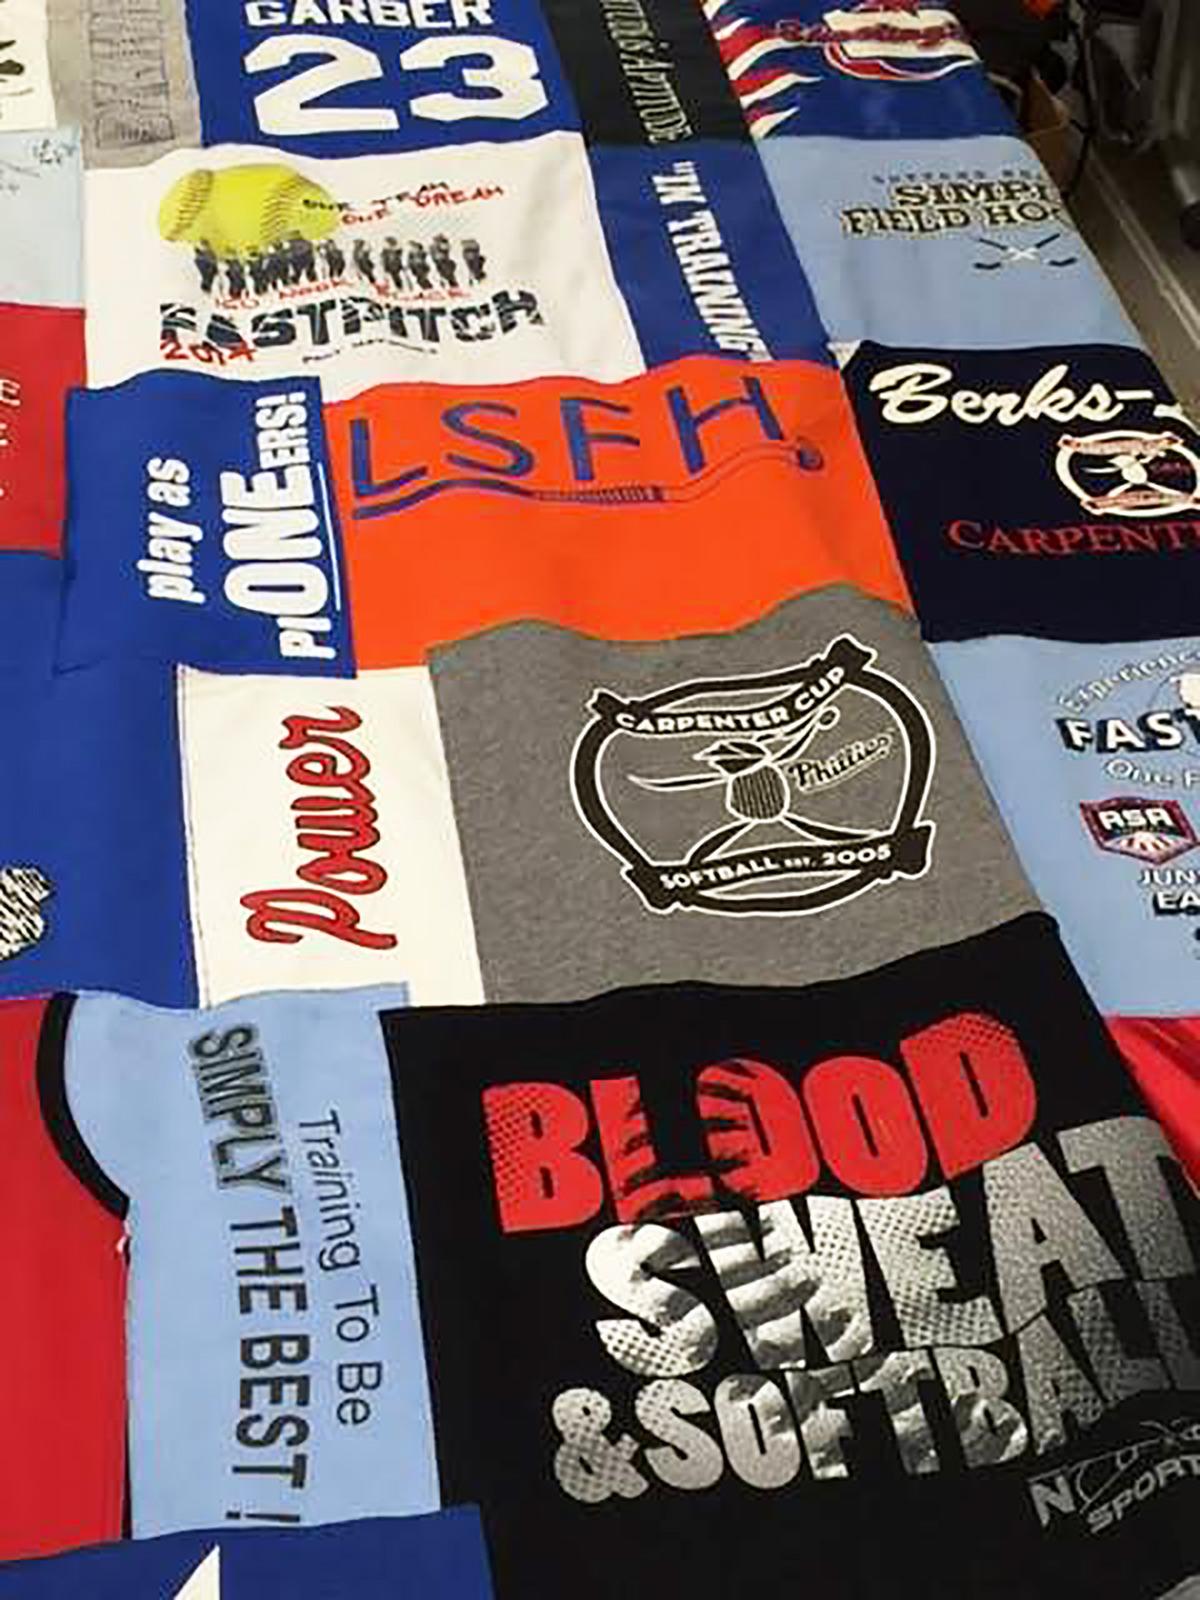 custom-t-shirt-quilts-DBH-designs-willow-street-pennsylvania-5.jpg